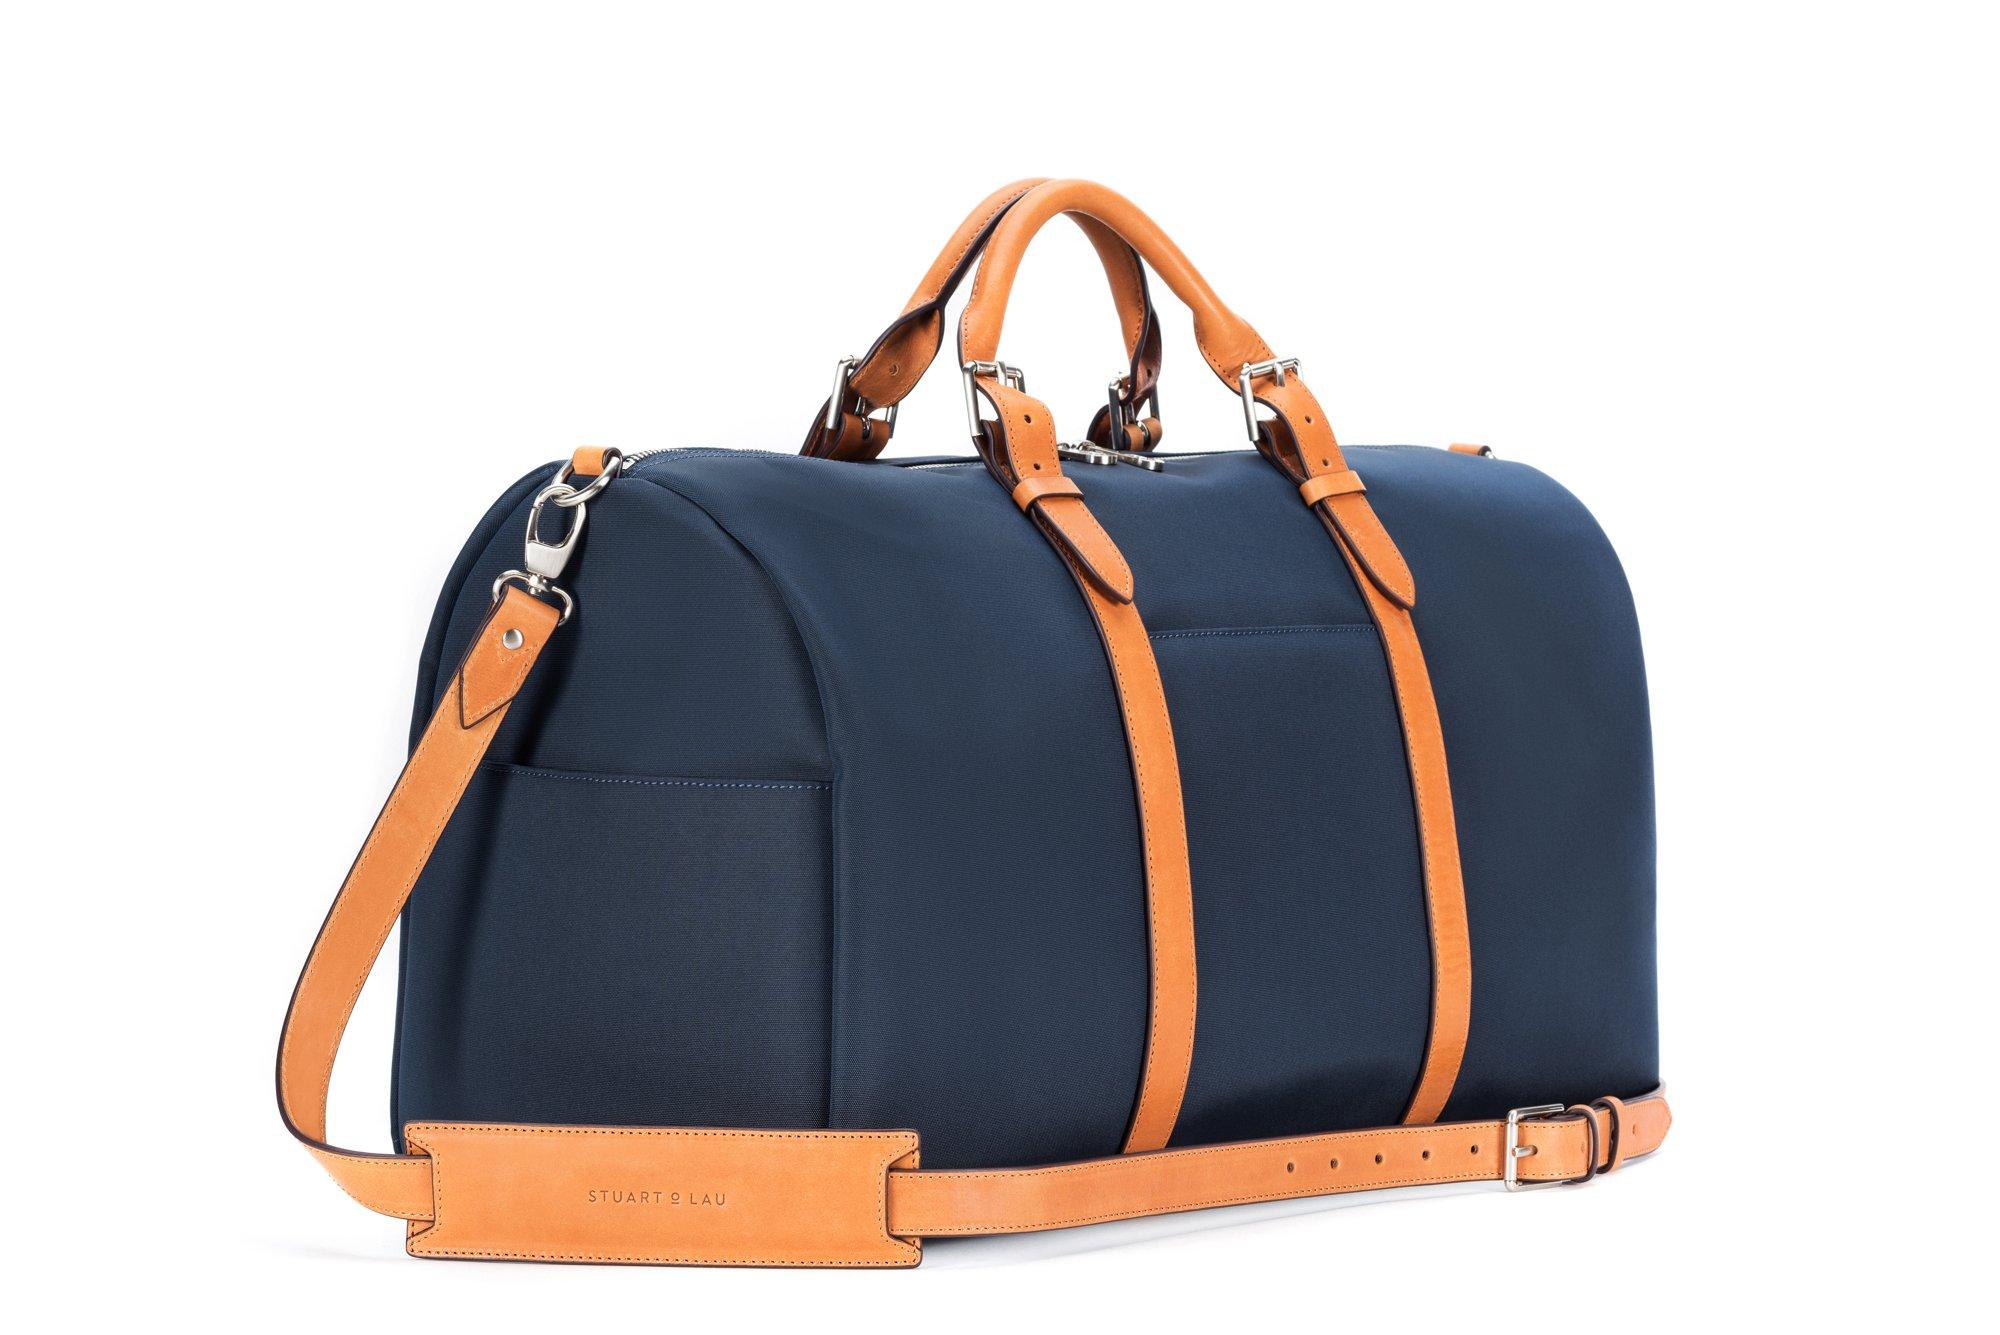 Weekender Bag for Men | Weekender Bag for Women | Patagonia Travel Bag